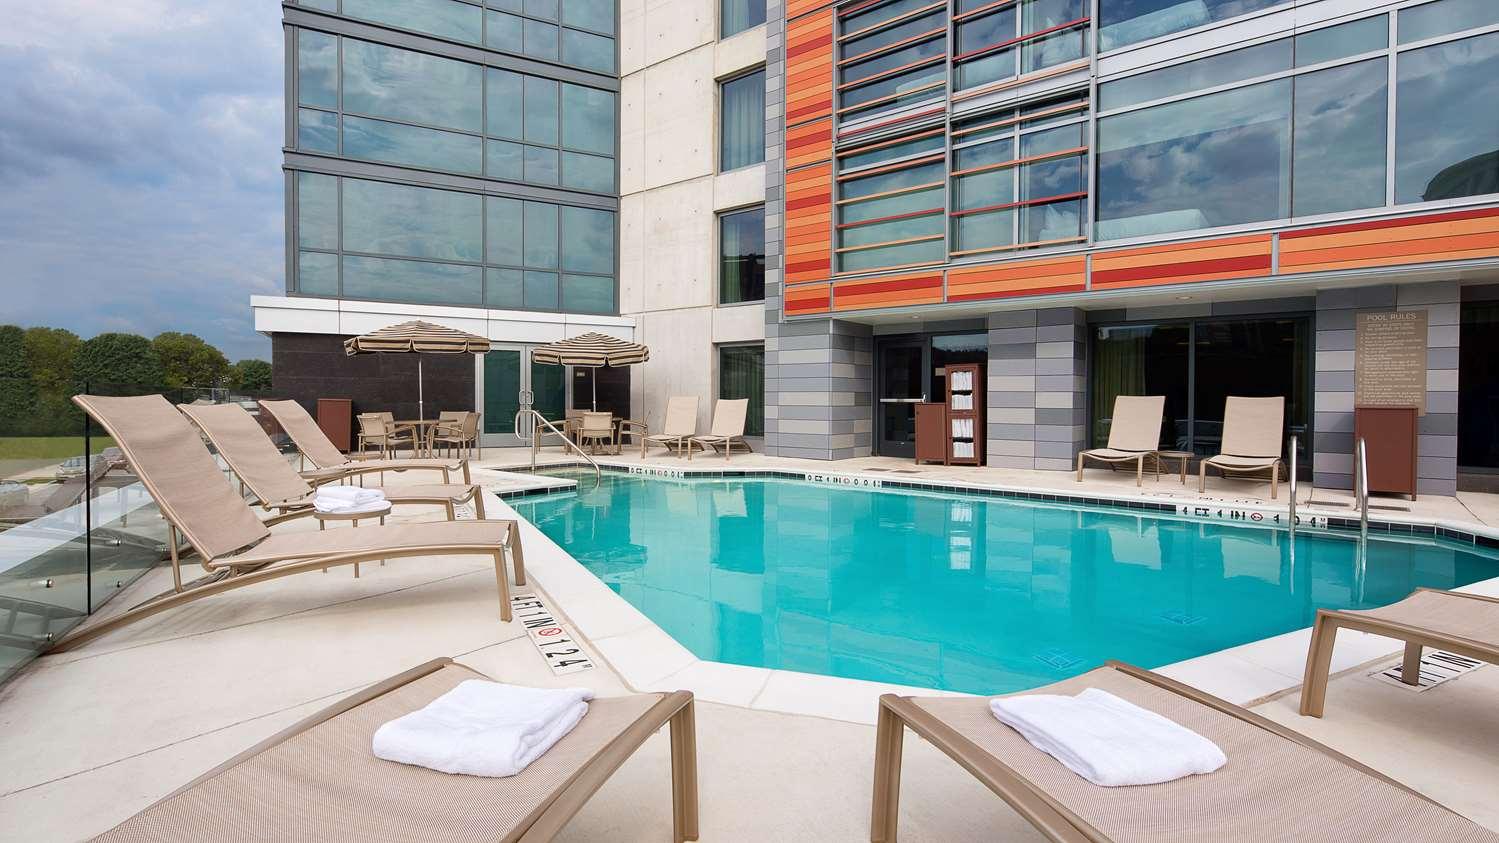 Pool - Hyatt Place Hotel Northeast Washington DC